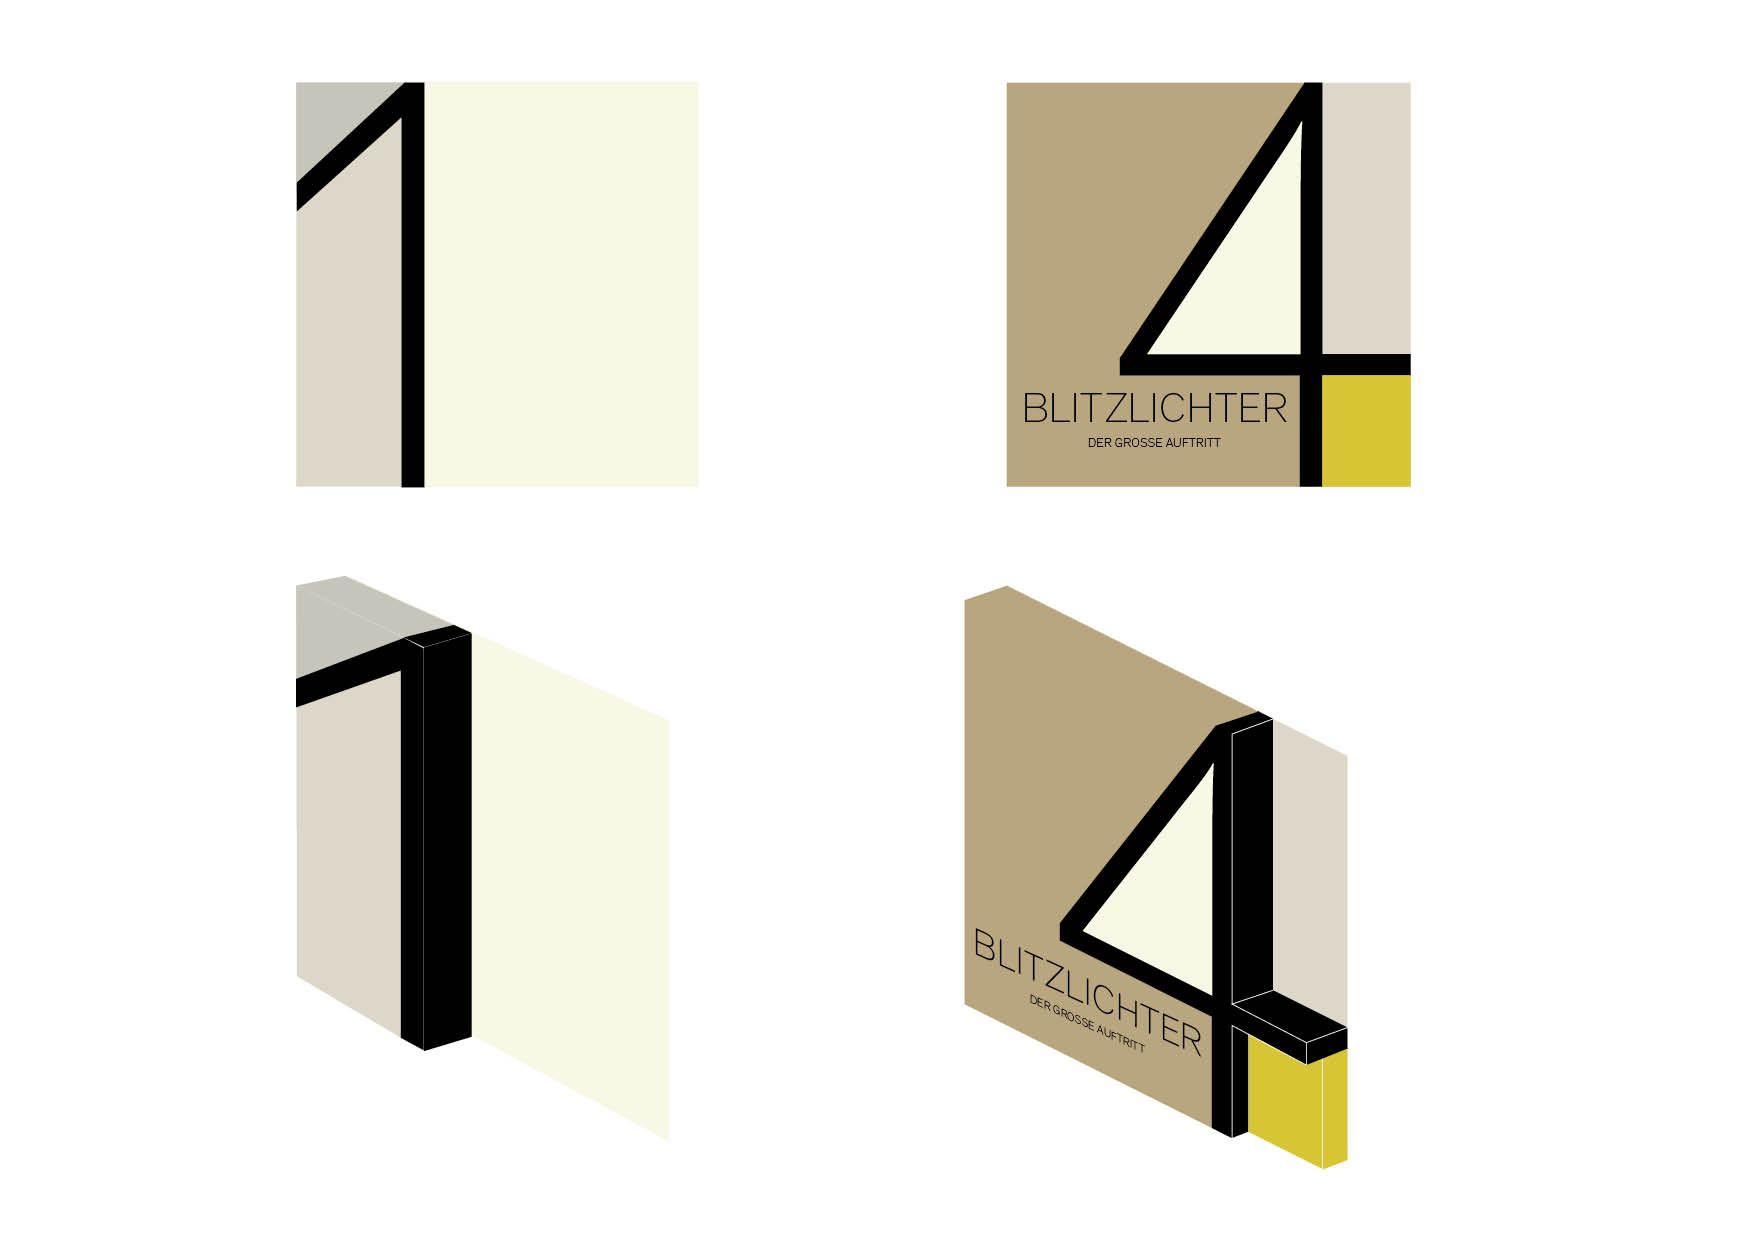 Modissa, CI/CD and Signage Design: GUSTAVE  #Signage #Illustration #Graphic #Design